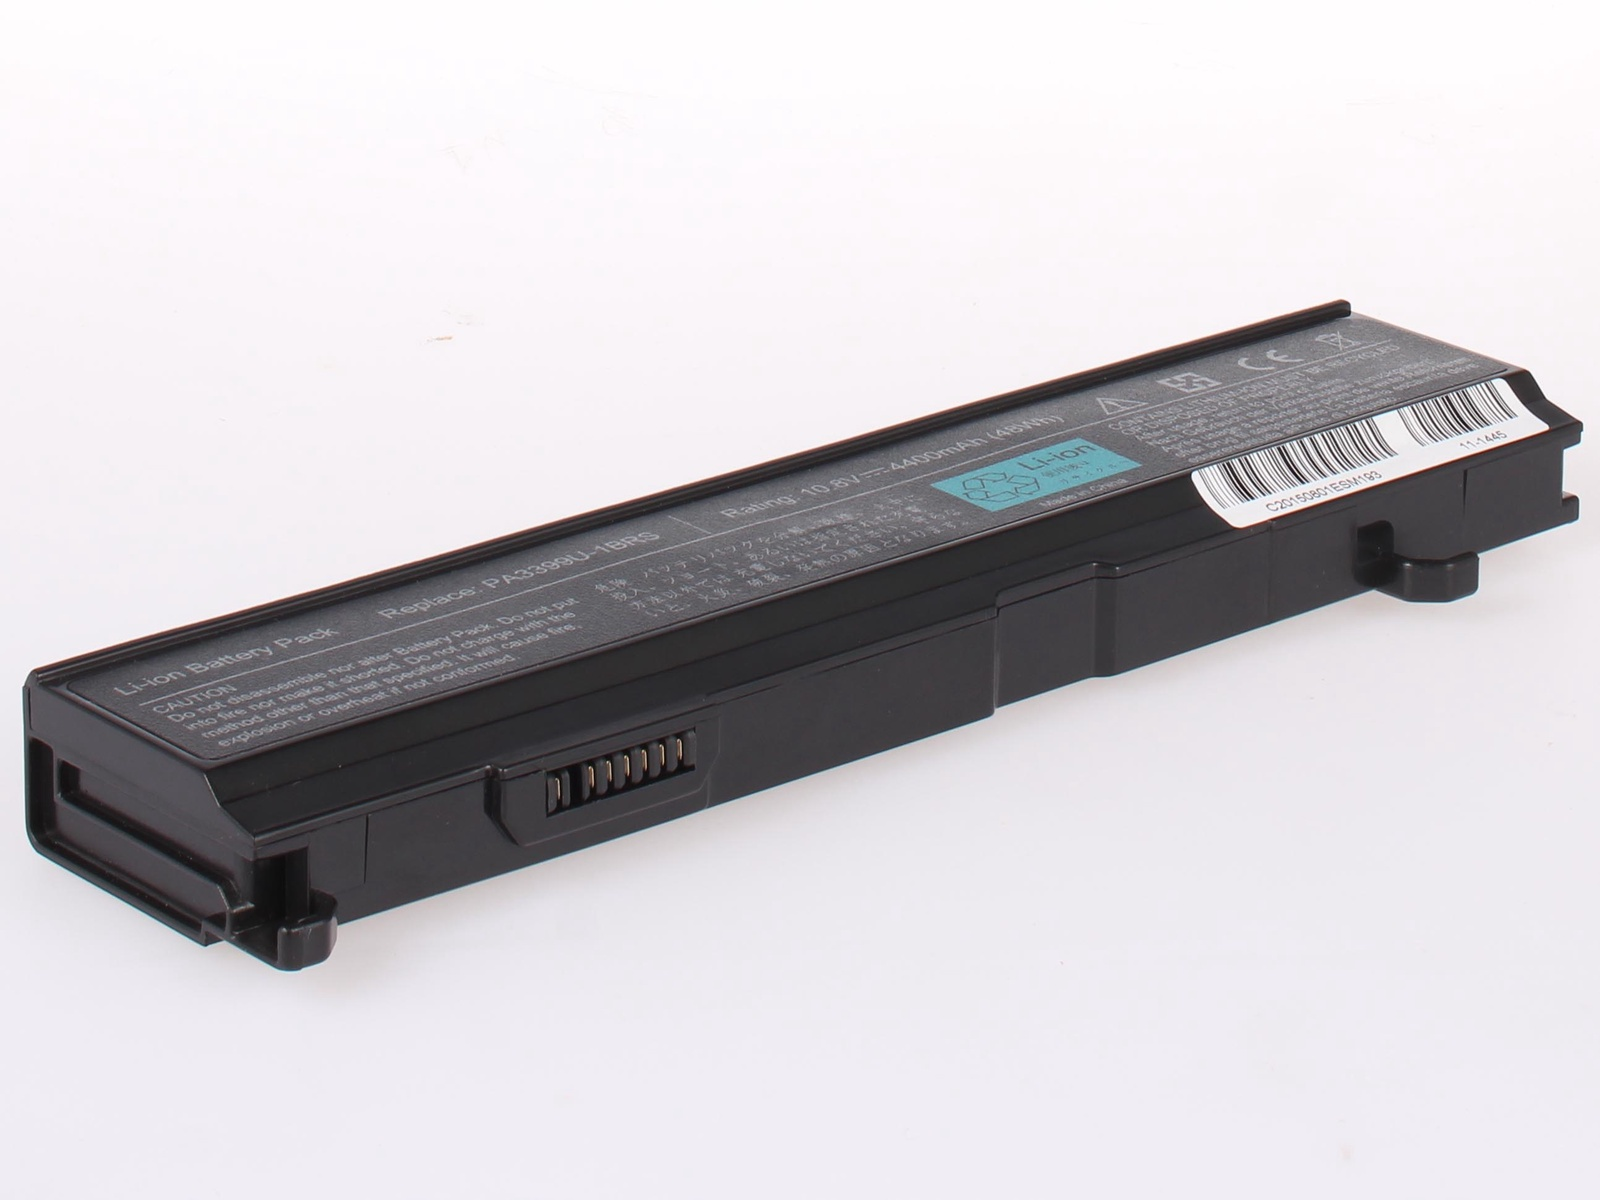 Аккумулятор для ноутбука AnyBatt для ToshiBa Satellite A105-S4134, Satellite A80-127, Satellite A80-129, Satellite M70-191, Satellite A100-780, Satellite A100-813, Satellite A105-S4184, Satellite M105-S3004, Satellite M45-S351 цена